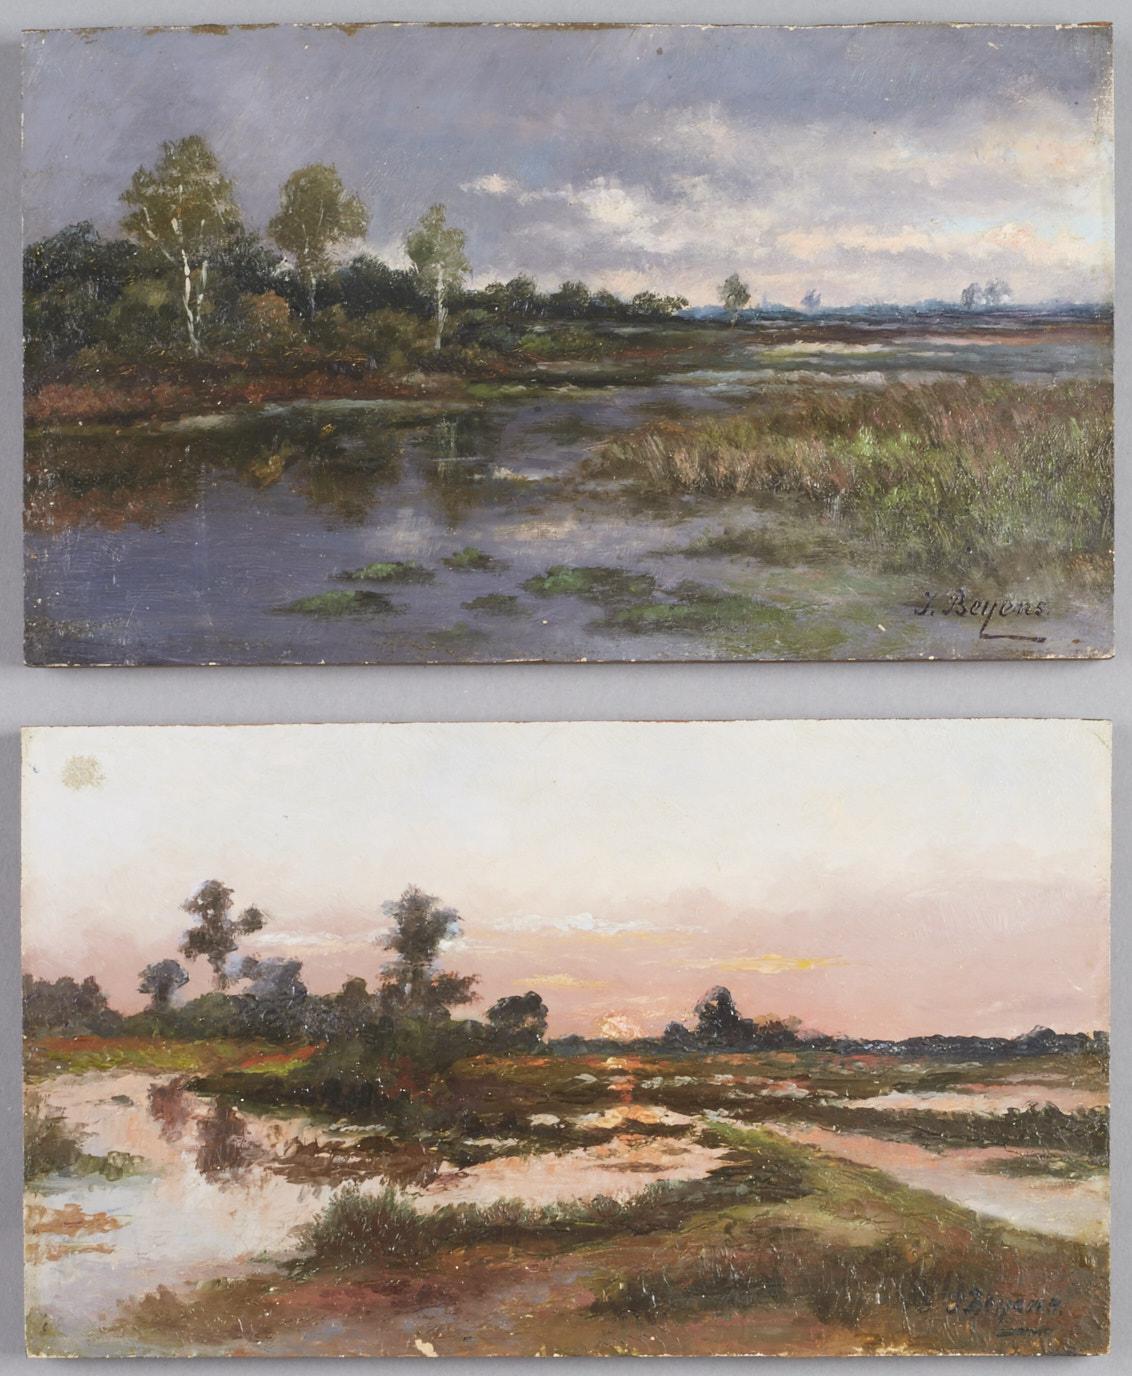 Lot 18 - Pair of Continental School Landscape Paintings Beyens